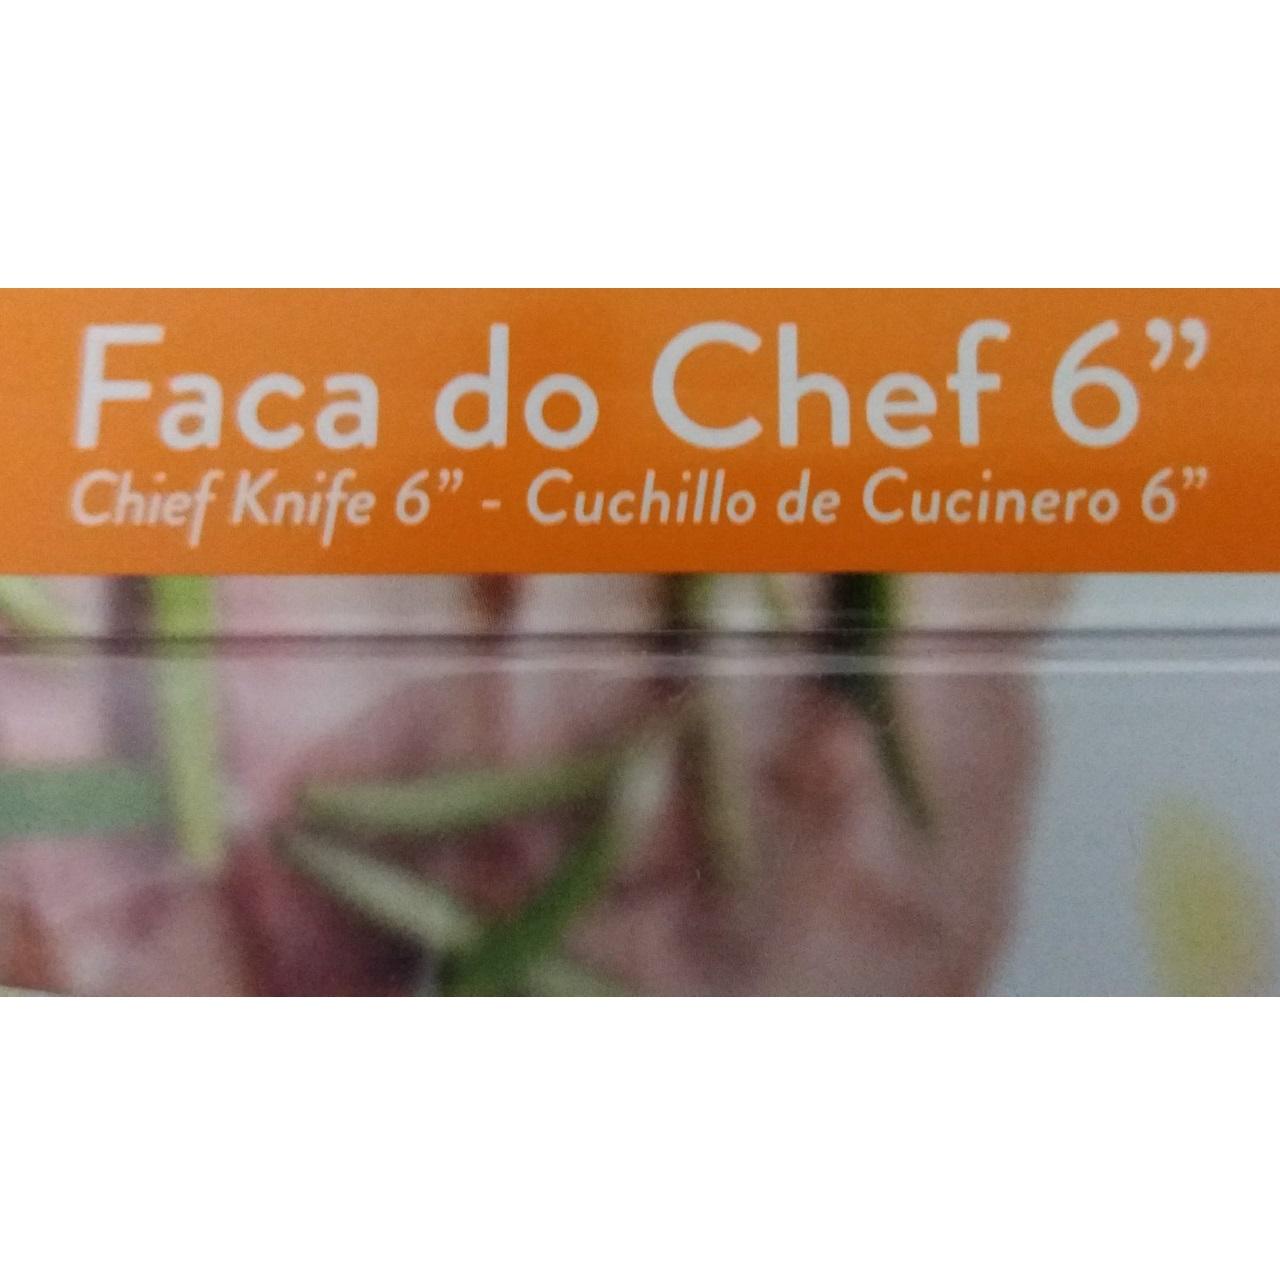 Faca 6 Official Knife Gastronomie MasterChef